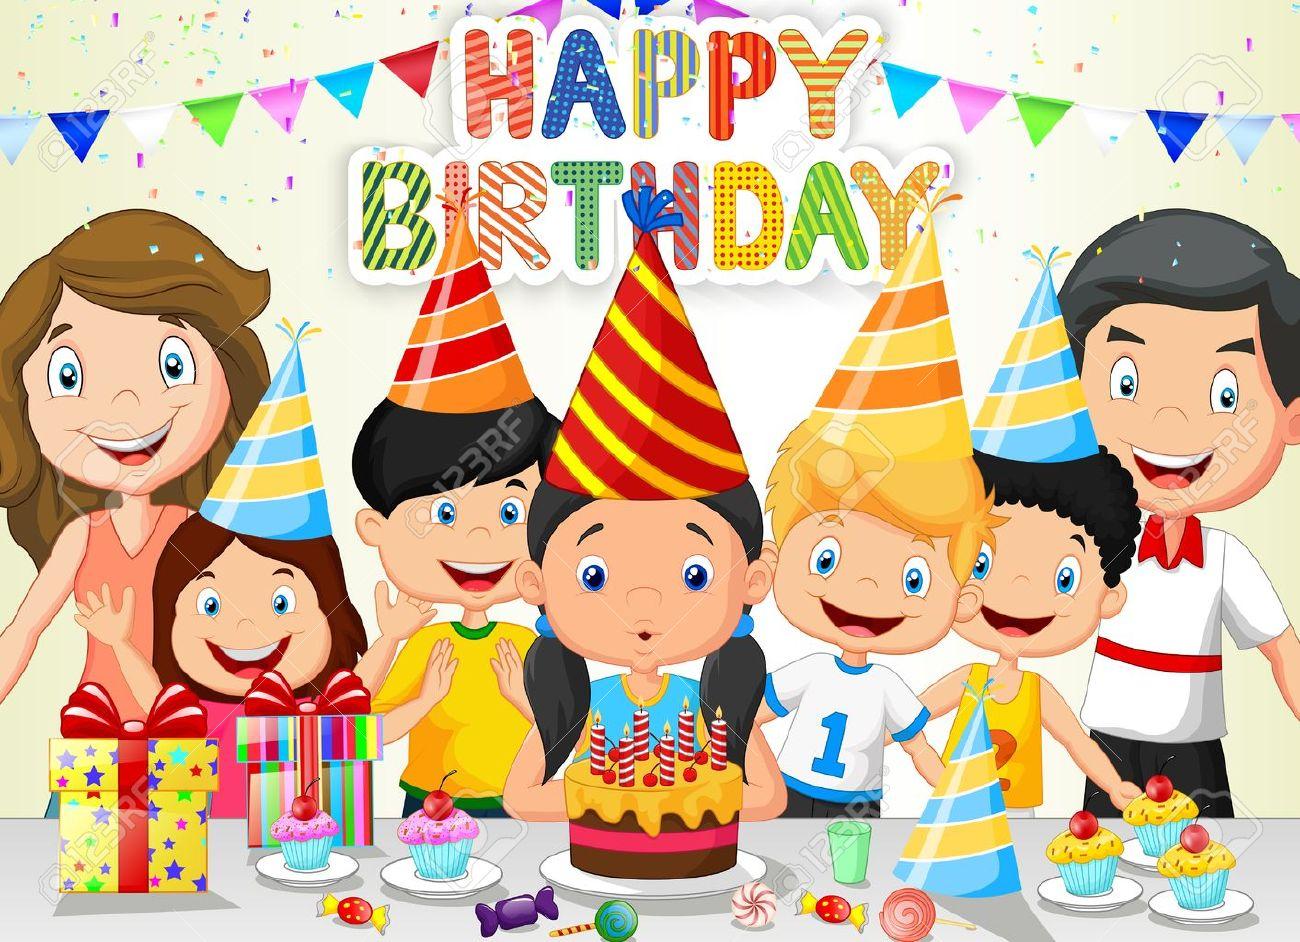 409 723 birthday celebration cliparts stock vector and royalty free rh 123rf com 70th birthday celebration clipart 50th birthday celebration clipart